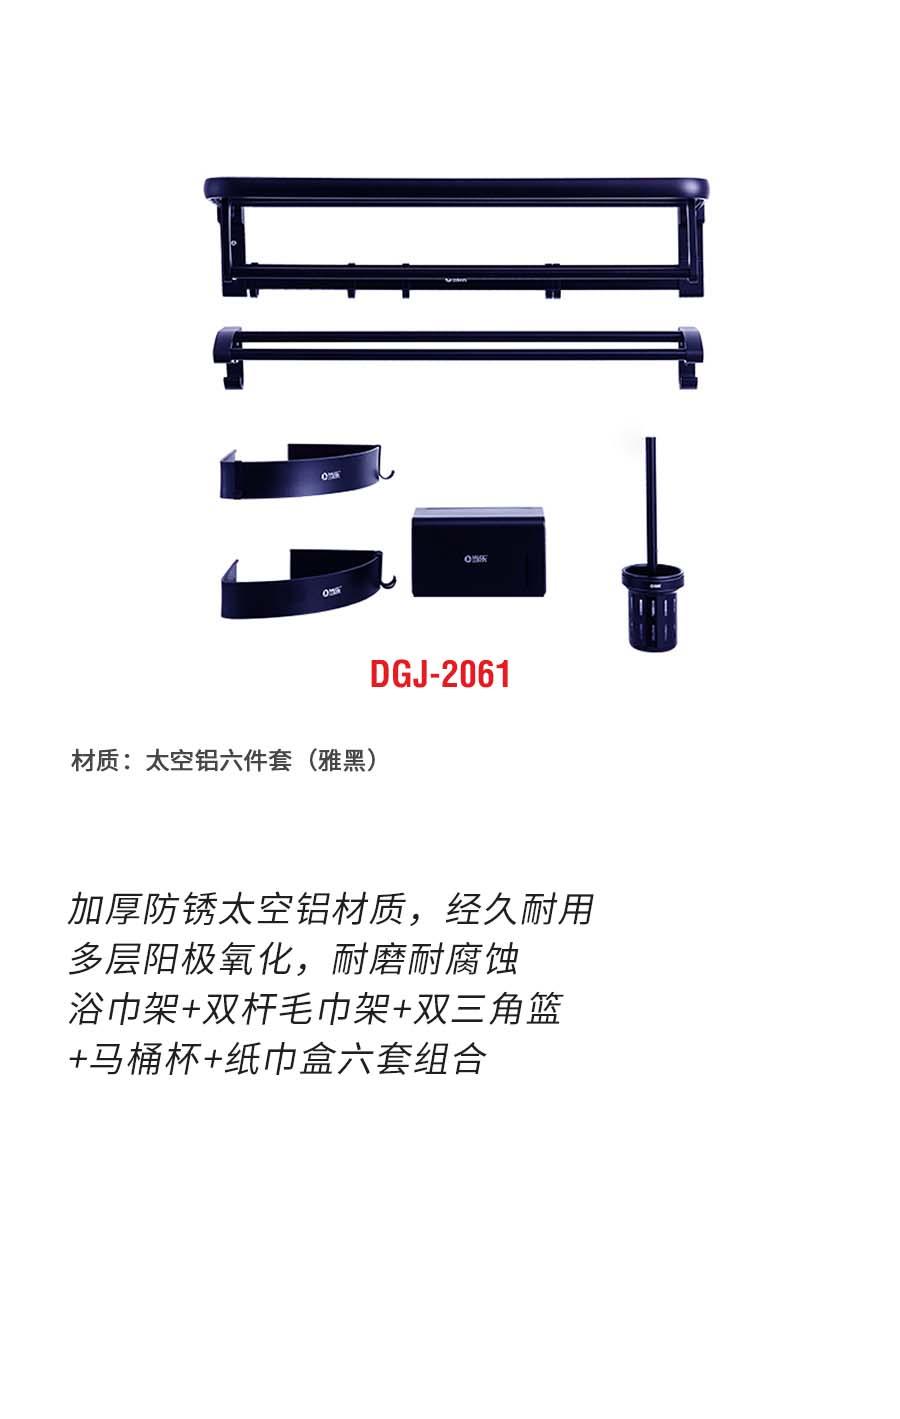 DGJ-2061b.jpg